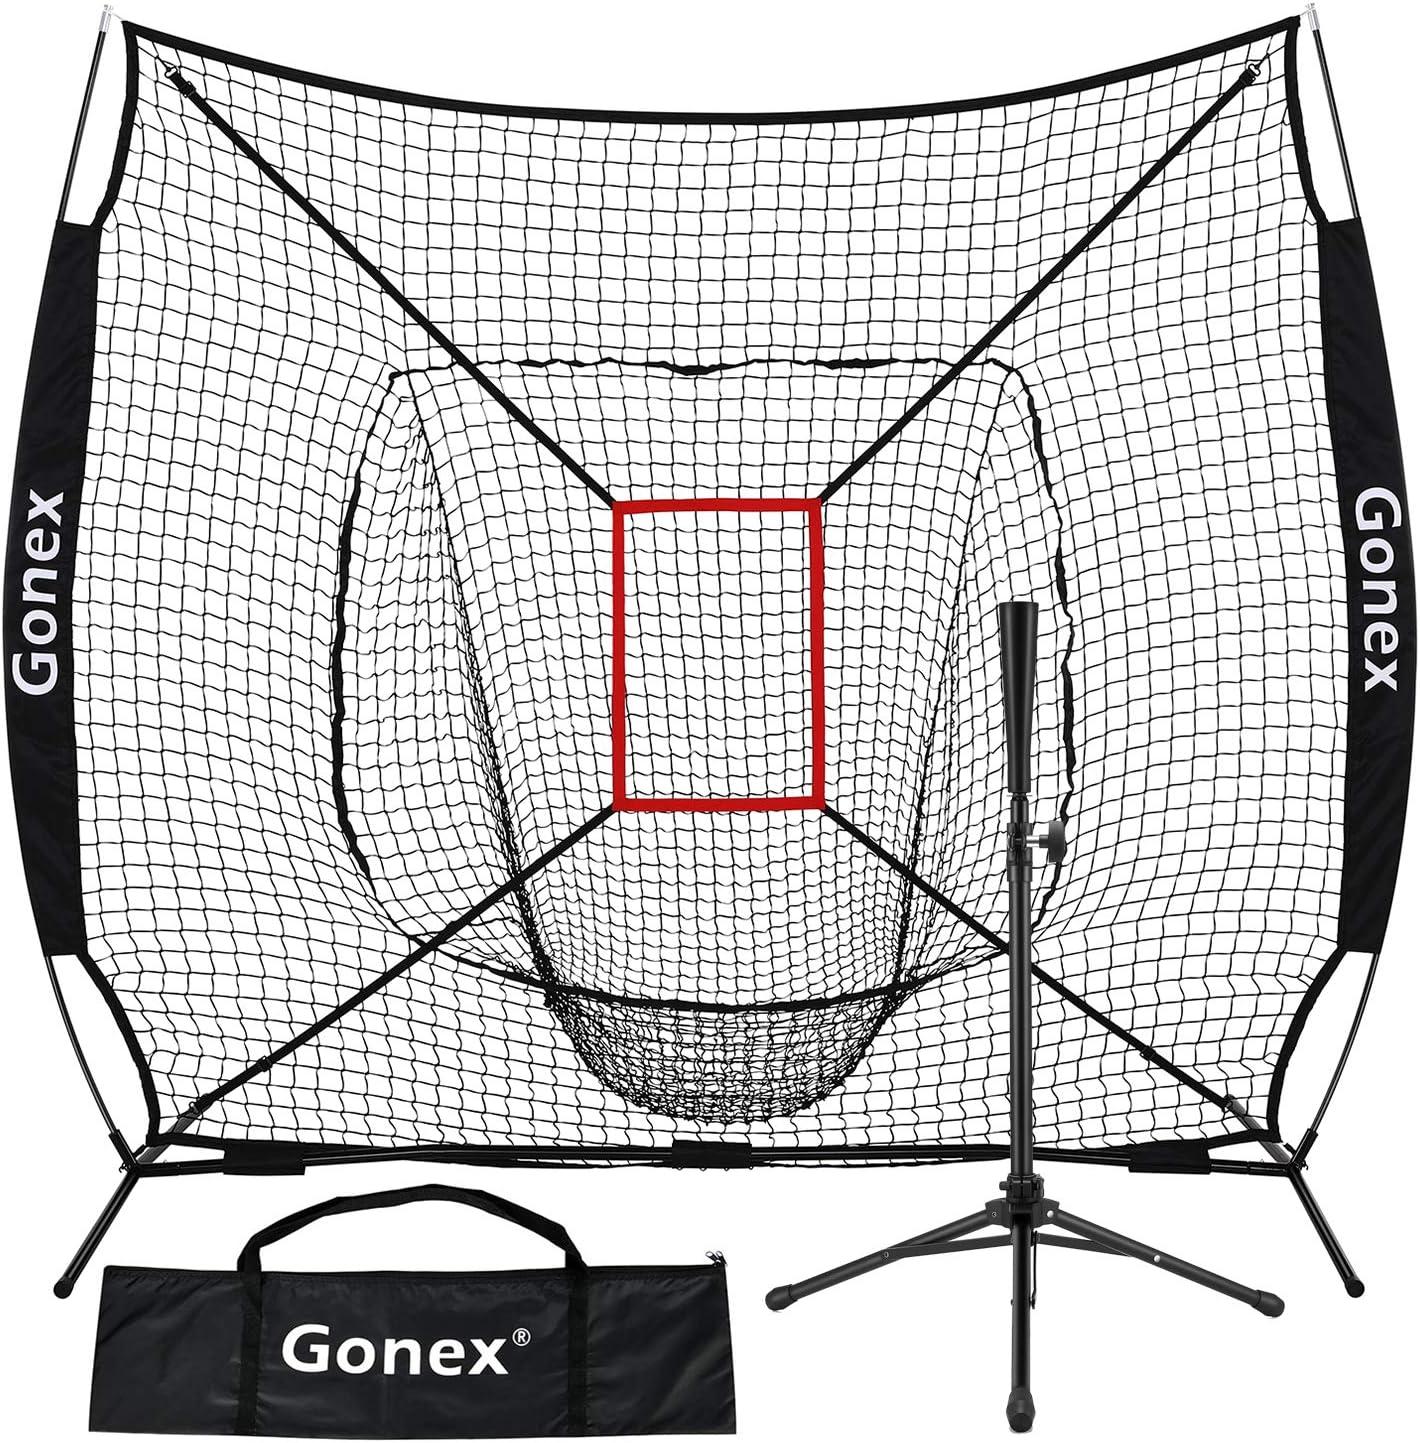 cheap Gonex 7' x Baseball Softball Practice Finally resale start Batting Set Te with Net